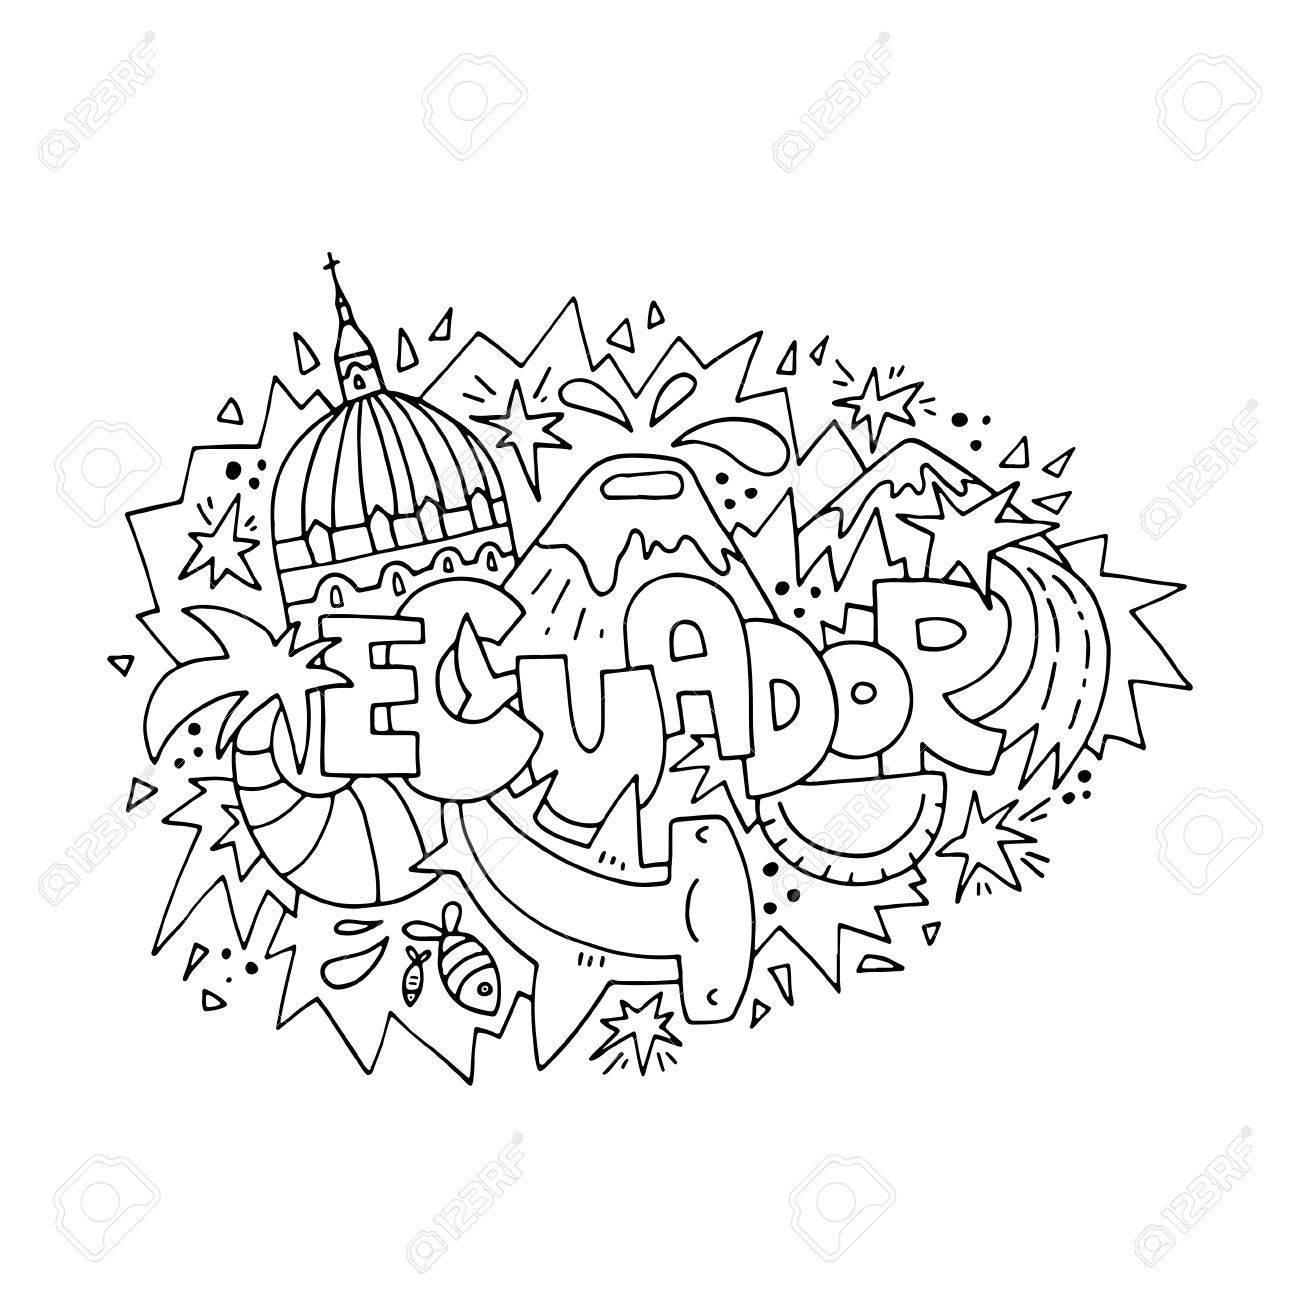 Ecuador Concept For Adult Coloring Book - Hand Drawn Illustration ...